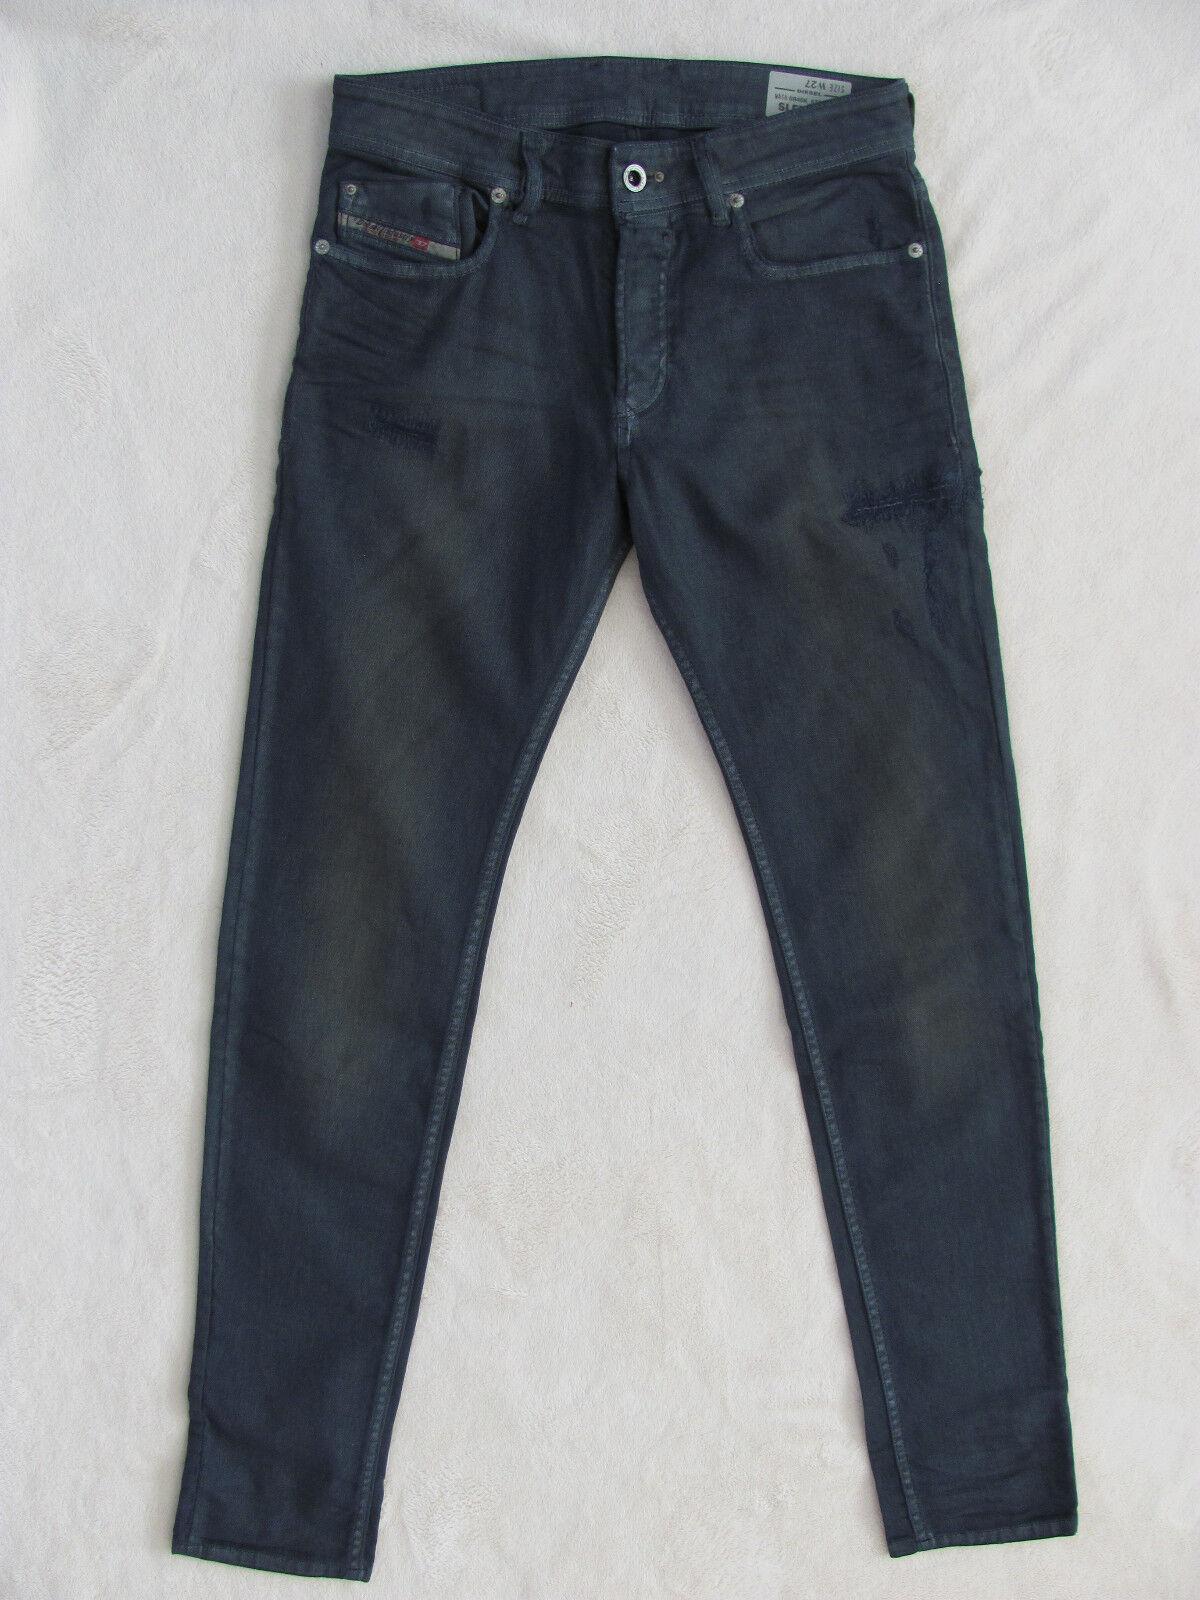 2026d535 Sleenker Jeans-Slim Skinny-Wash 0840K Midnight bluee-Size NWT Diesel 27-  npxfxc6388-Jeans